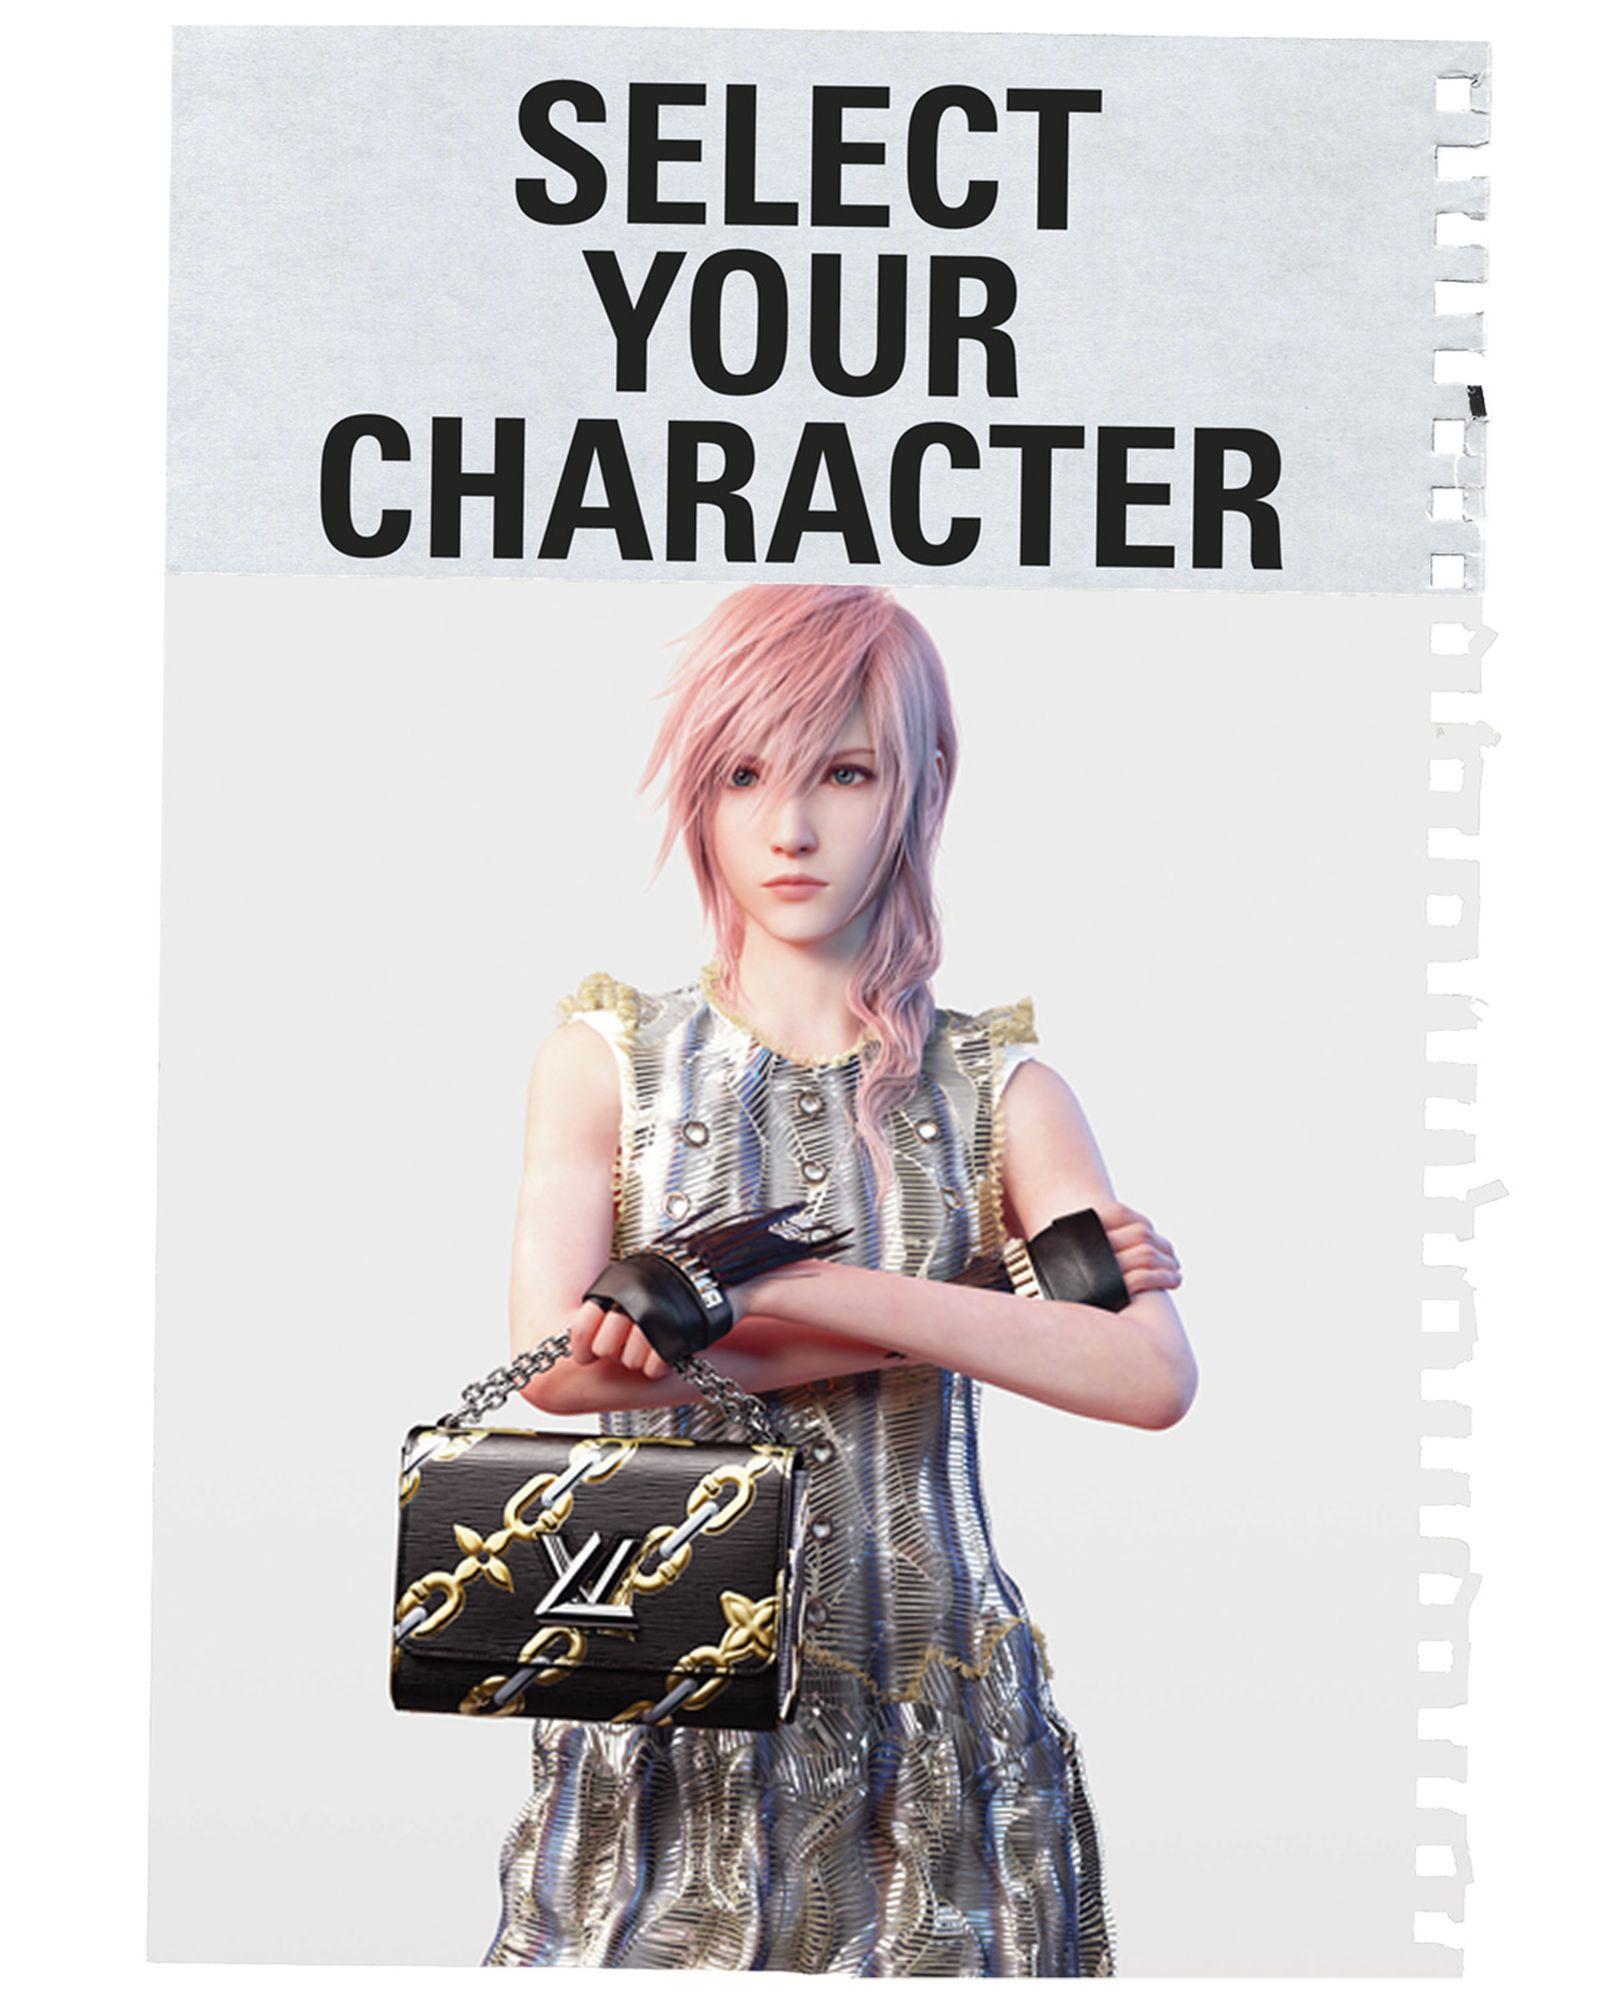 gaming-pushing-fashion-identity-crisis-main